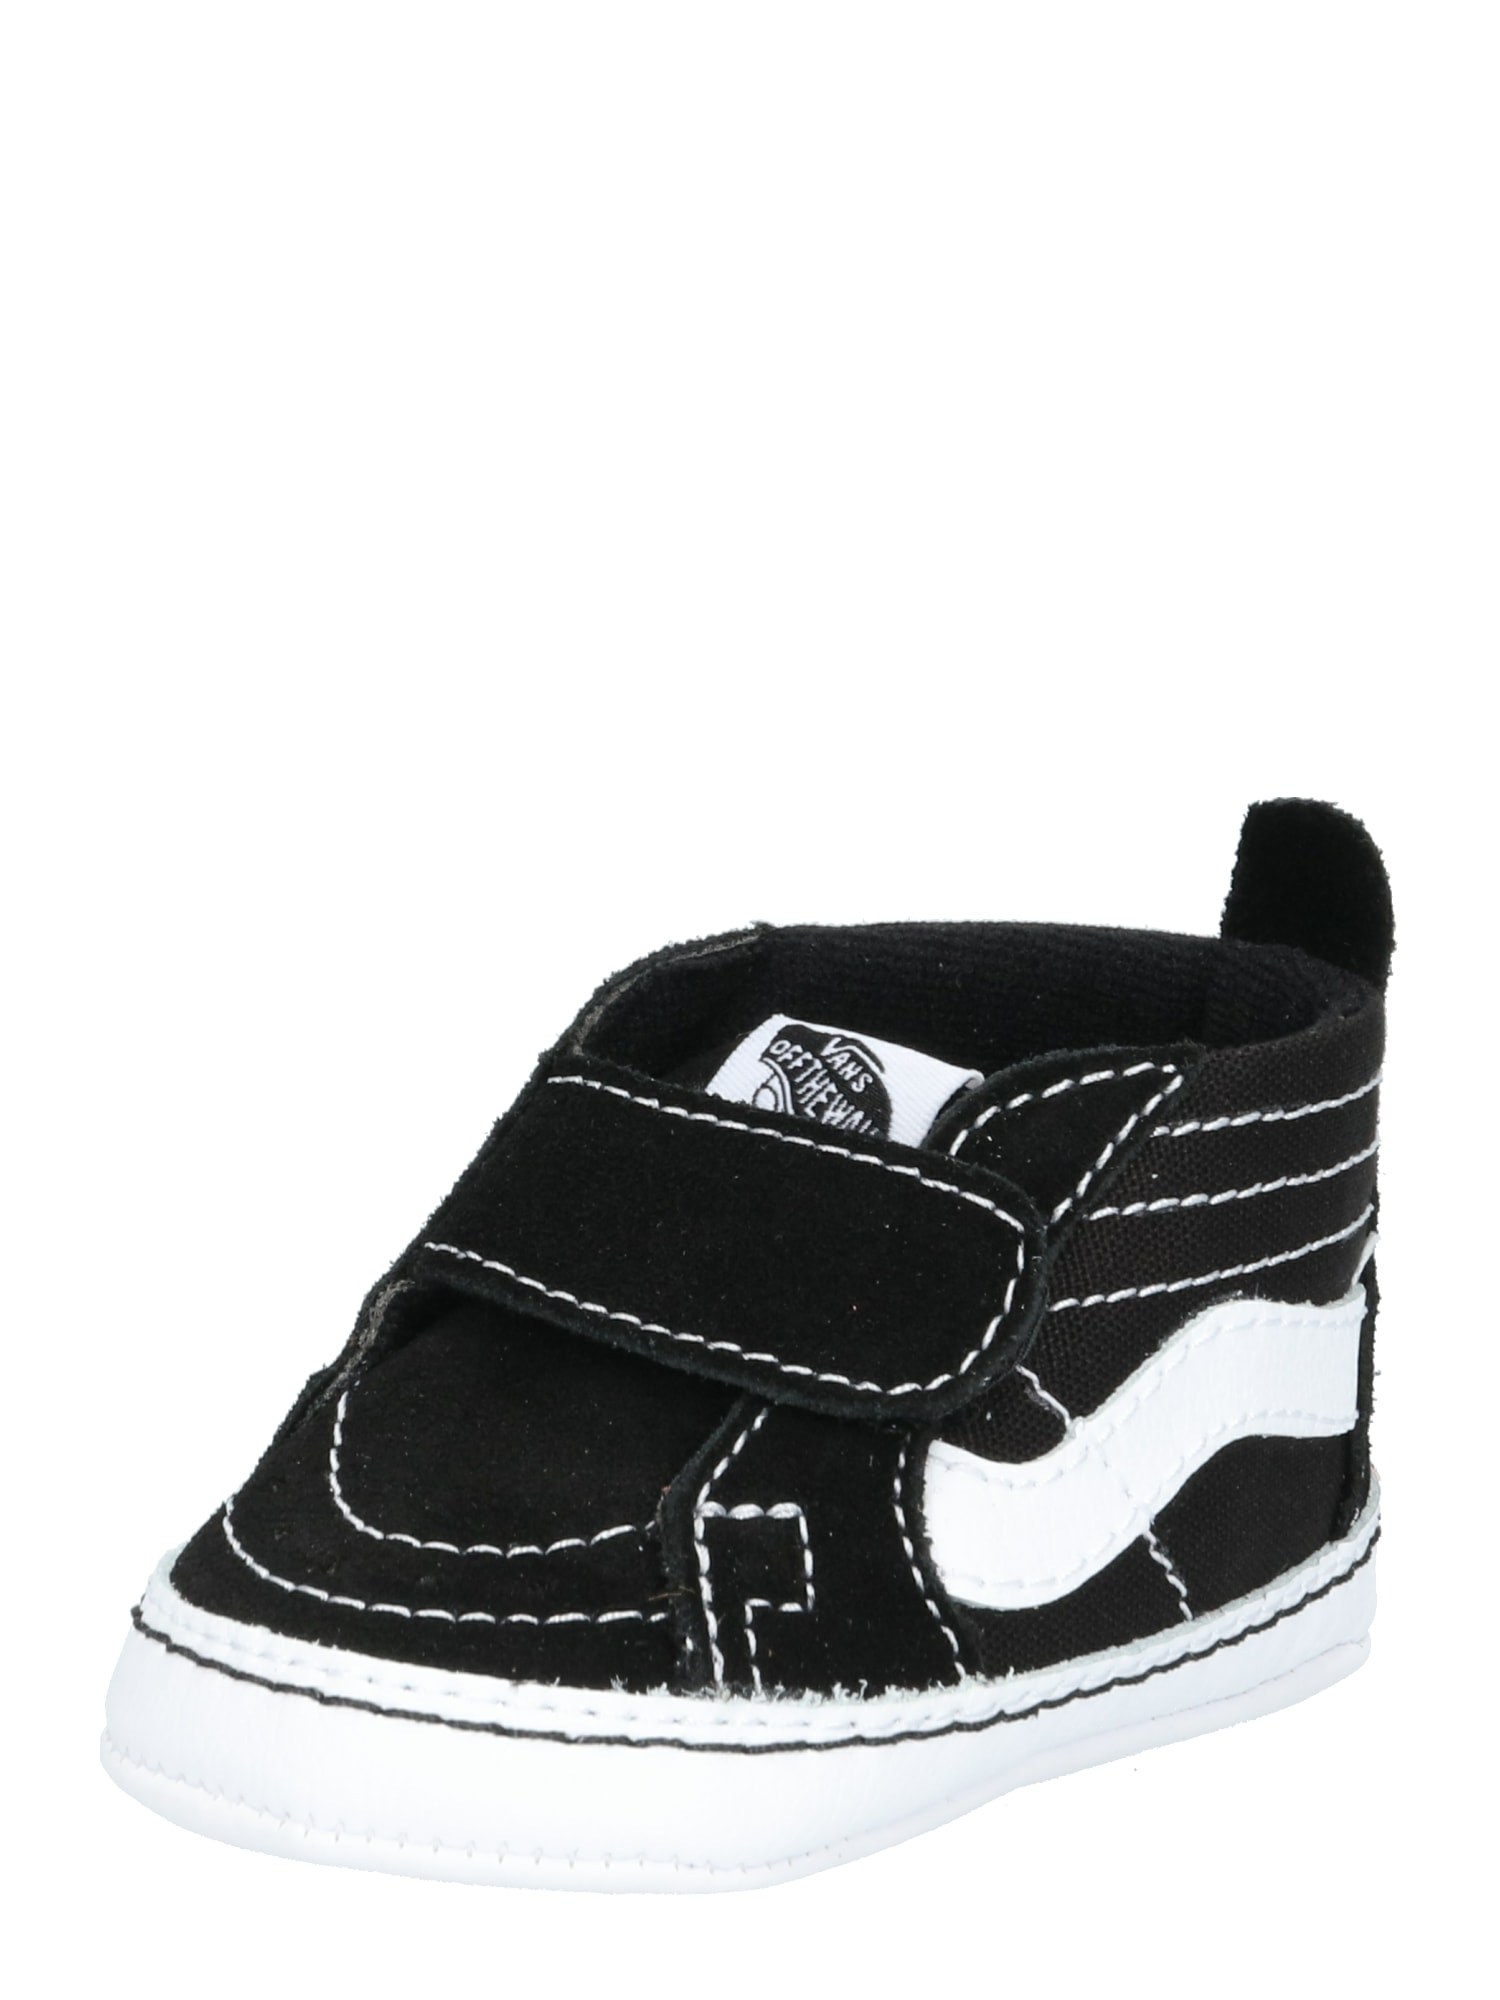 Babyschuhe - Schuhe 'IN SK8 Hi Crib' - Onlineshop ABOUT YOU